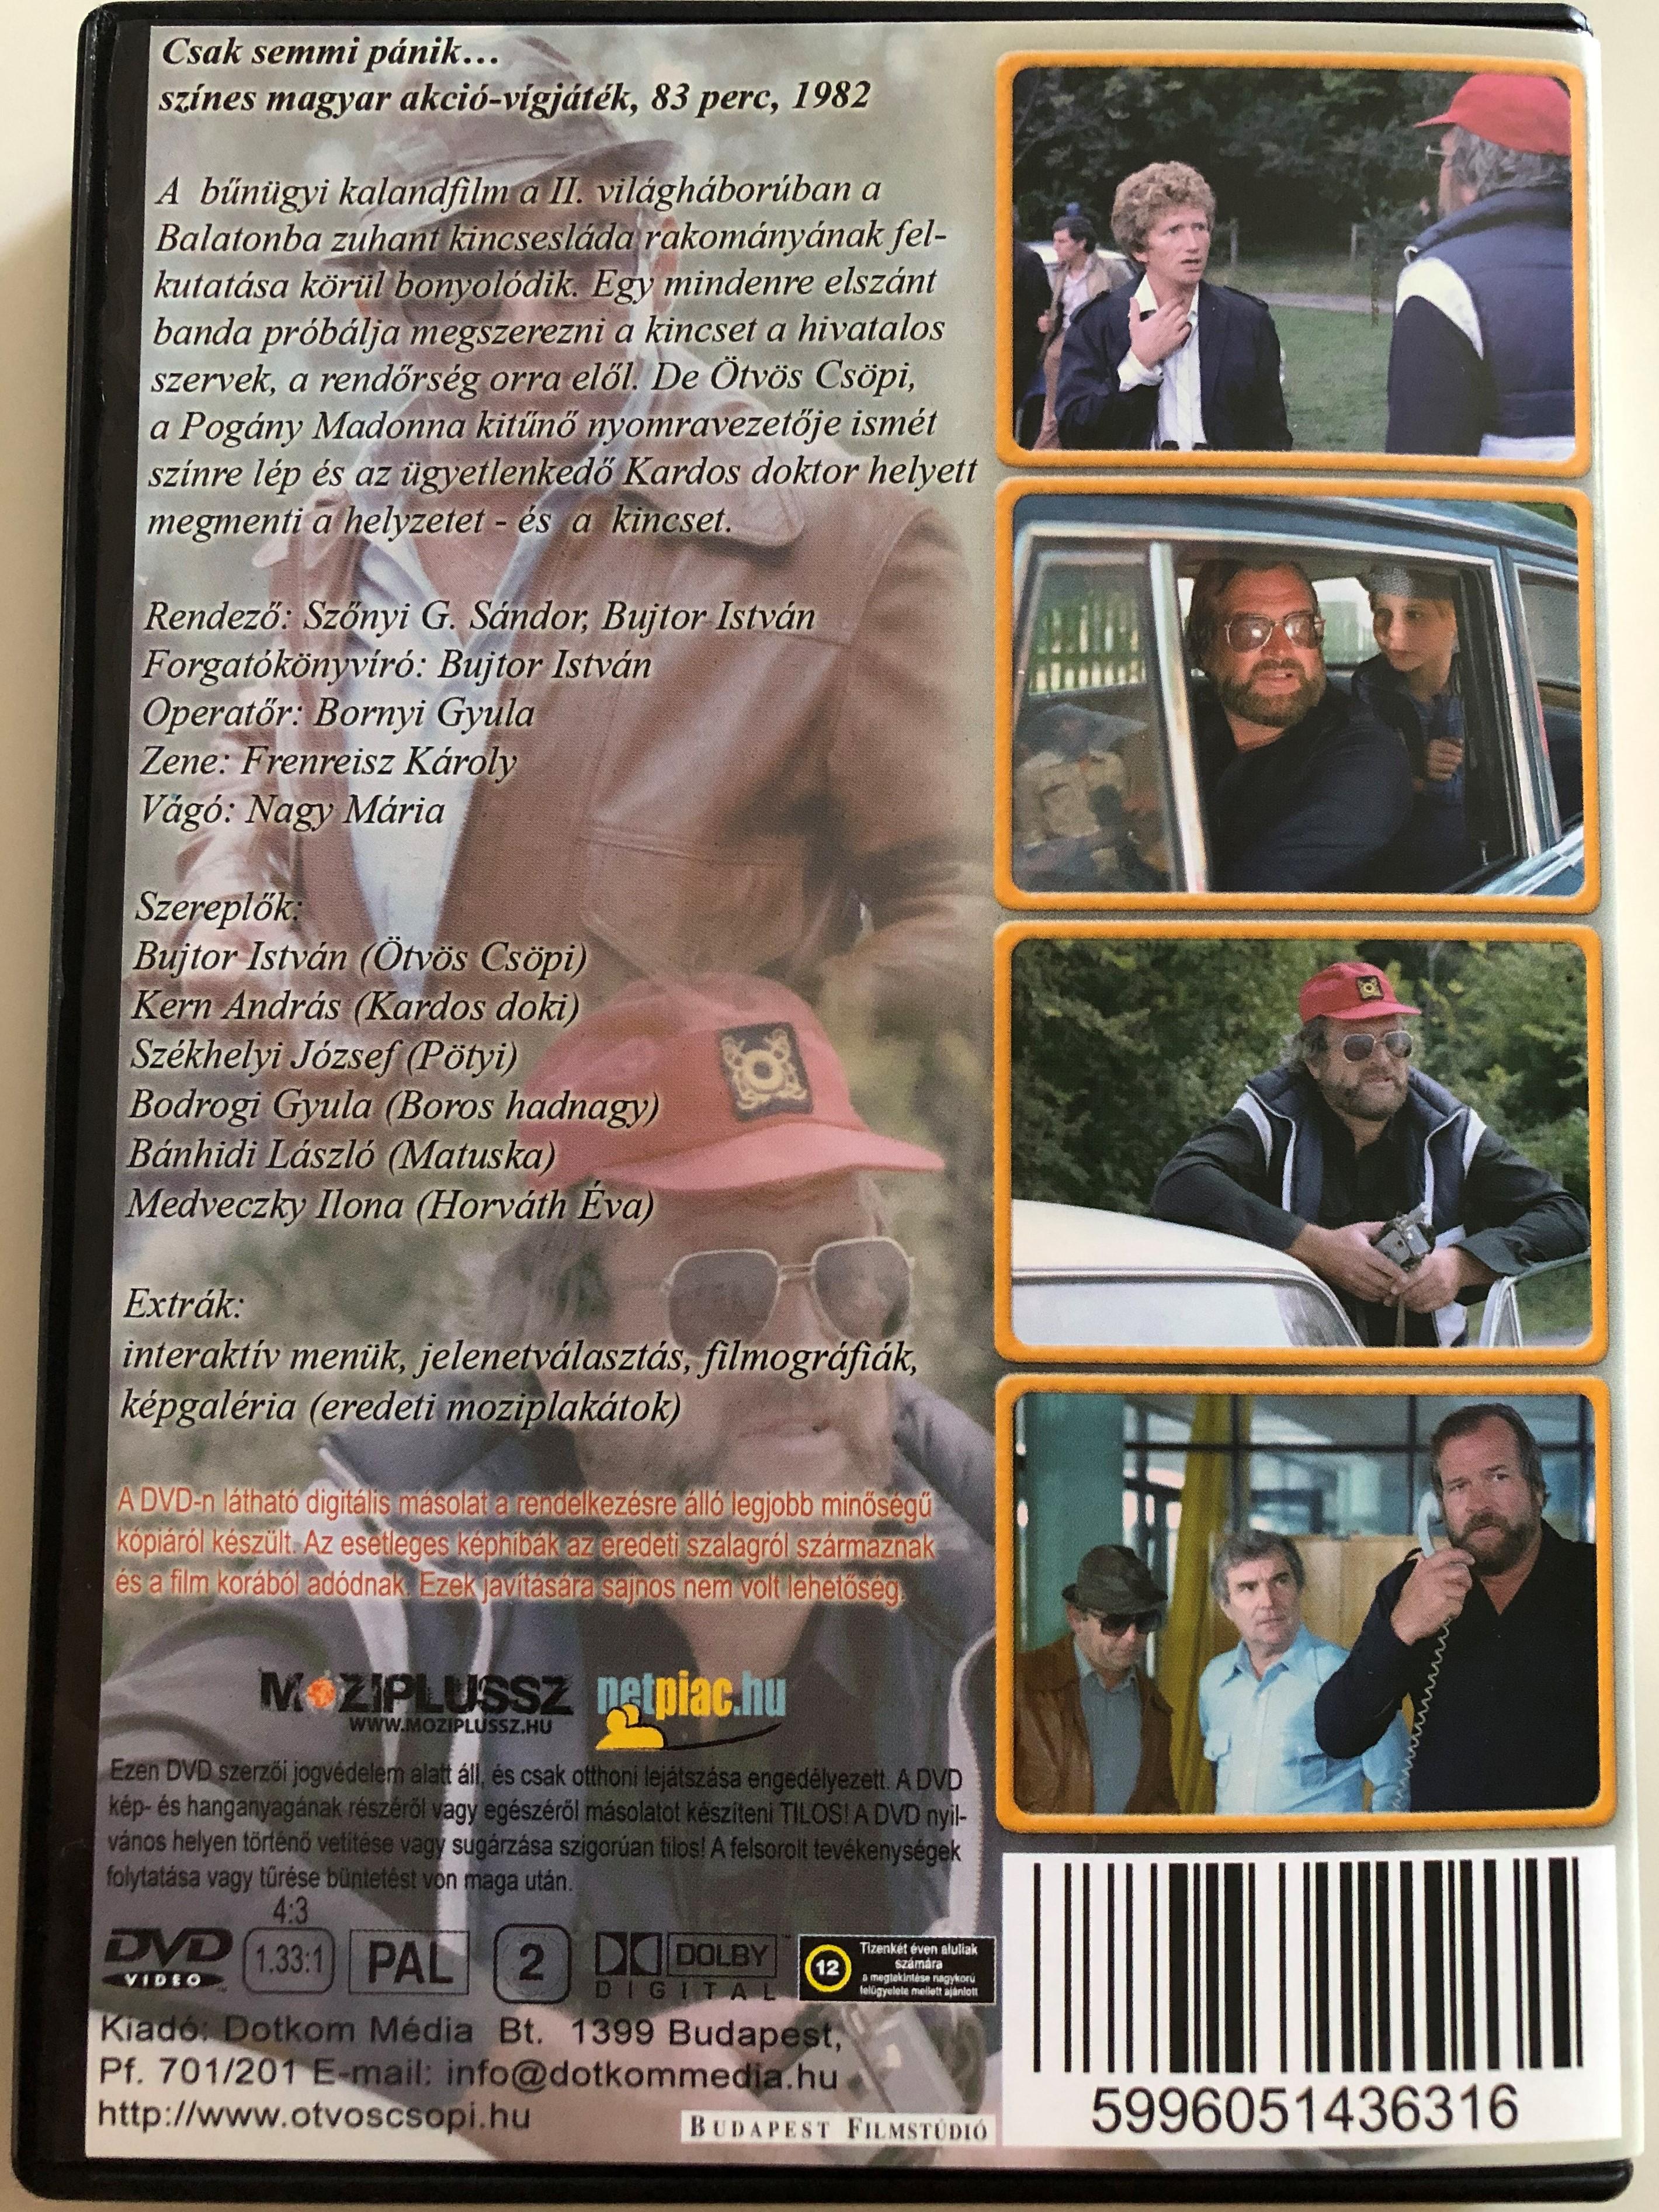 csak-semmi-p-nik-dvd-1982-do-not-panic-major-kardos-directed-by-sz-nyi-g.-s-ndor-starring-bujtor-istv-n-kern-andr-s-sz-khelyi-j-zsef-bodrogi-gyula-hungarian-action-comedy-2-.jpg